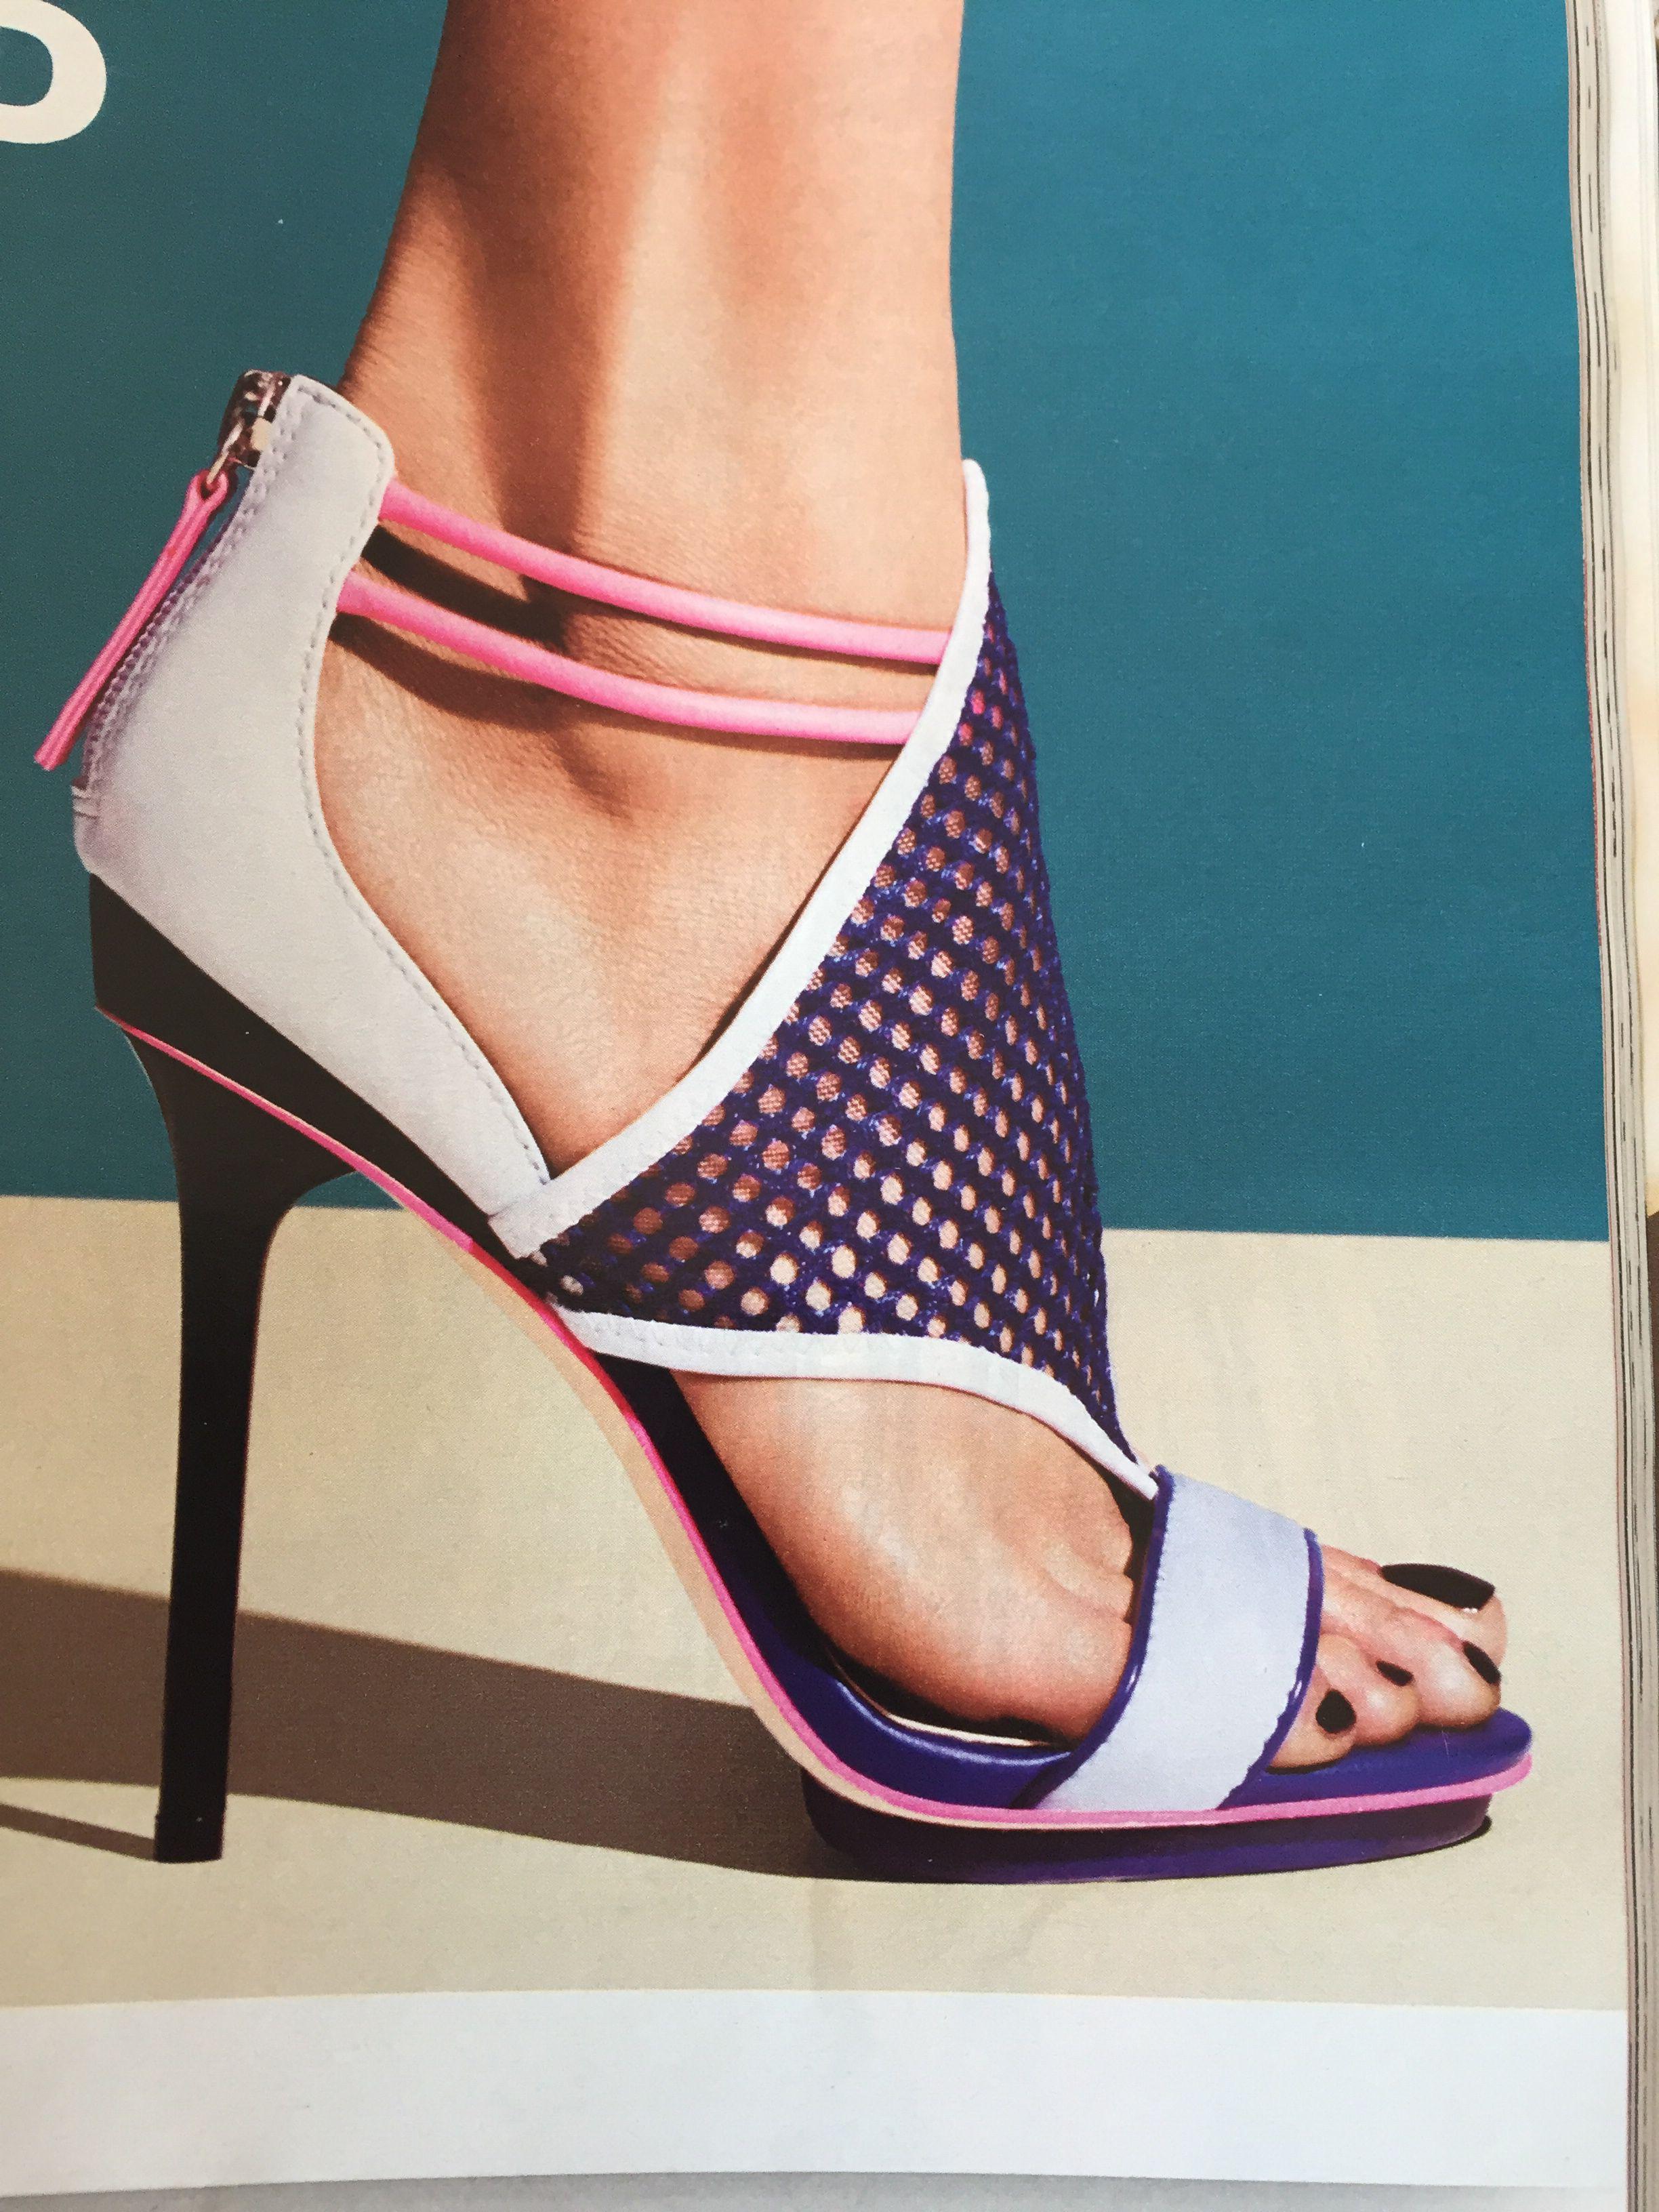 Gwen Stefani GX Sandal | Beautiful summer sandals, Gwen